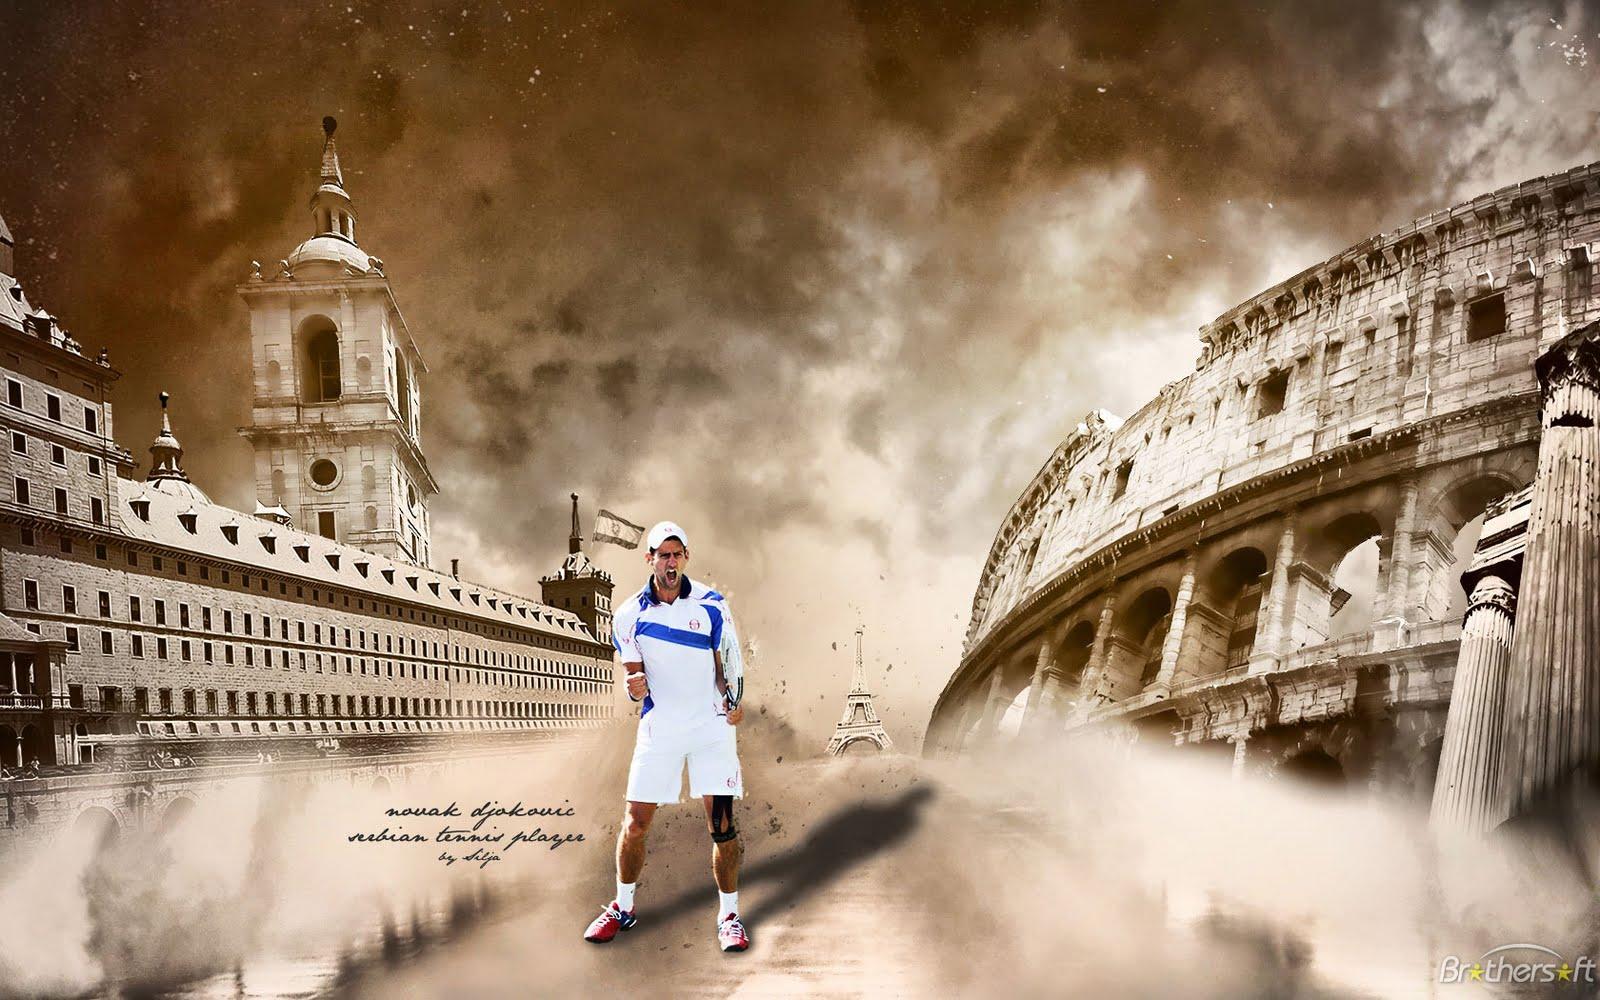 Beautiful wallpaper with a picture of Novak Djokovic 1600x1000